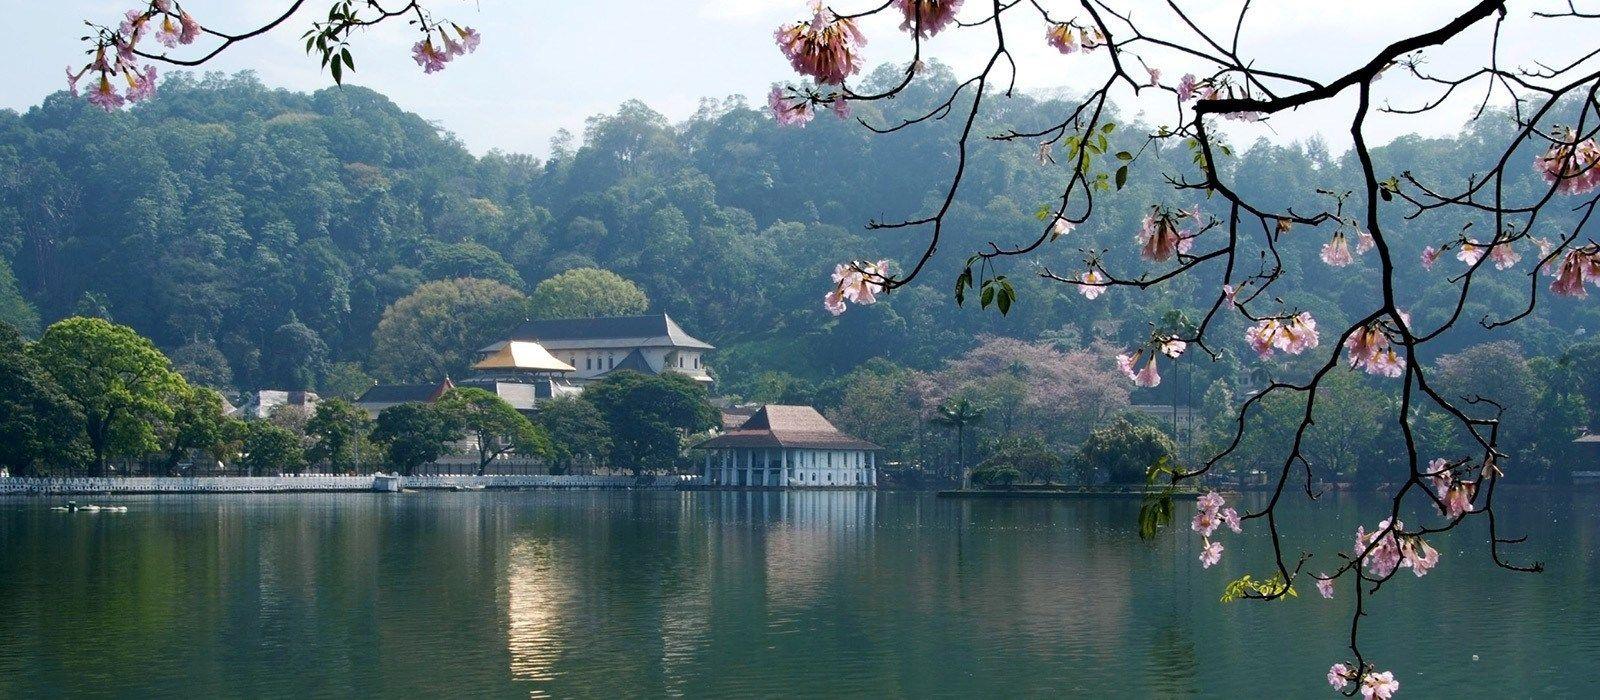 Simply Sri Lanka: Temples & Tea Tour Trip 5